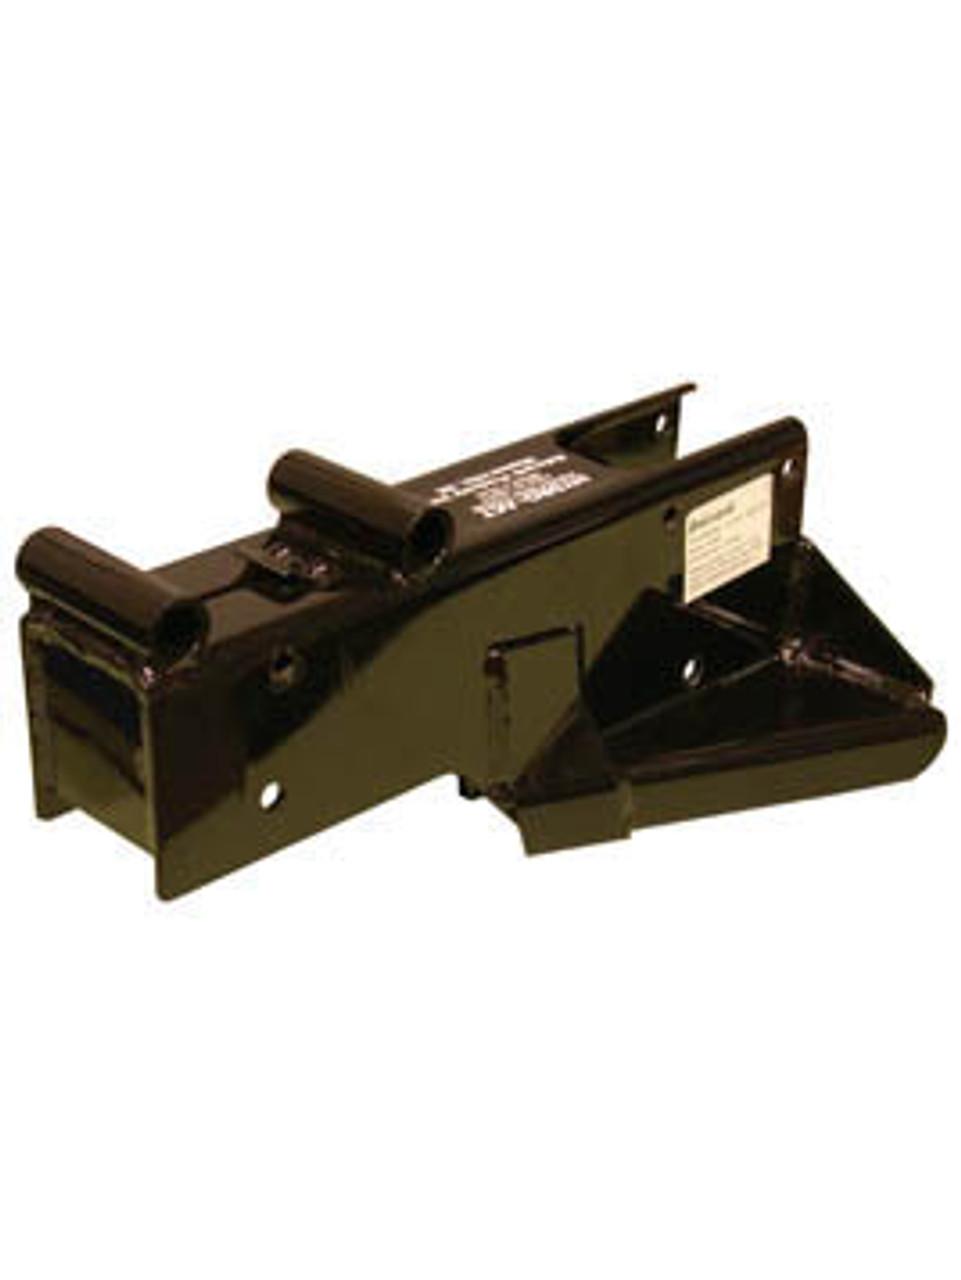 10601-2 --- Hydro-Act Actuator A-Frame Mount - 7,000 lbs